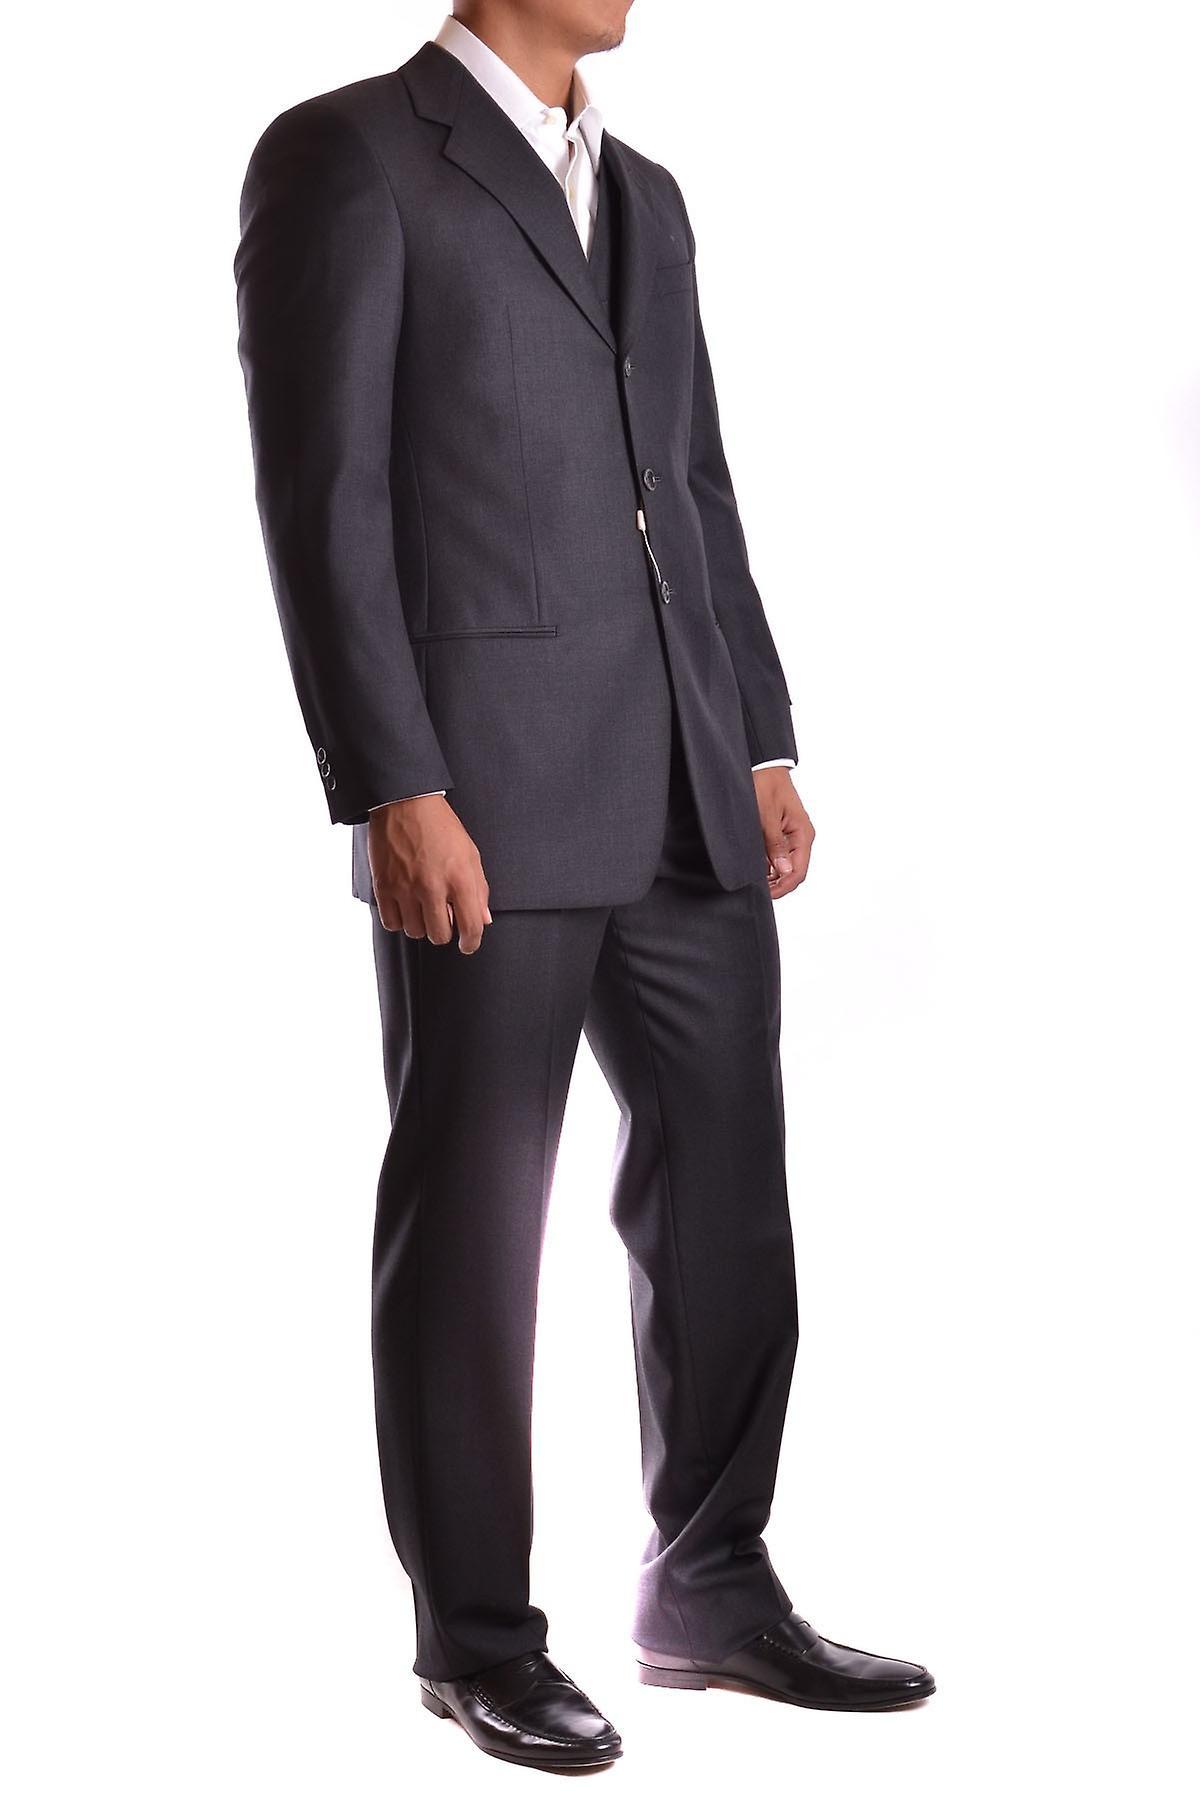 بدلة رمادية صوف Collezioni أرماني